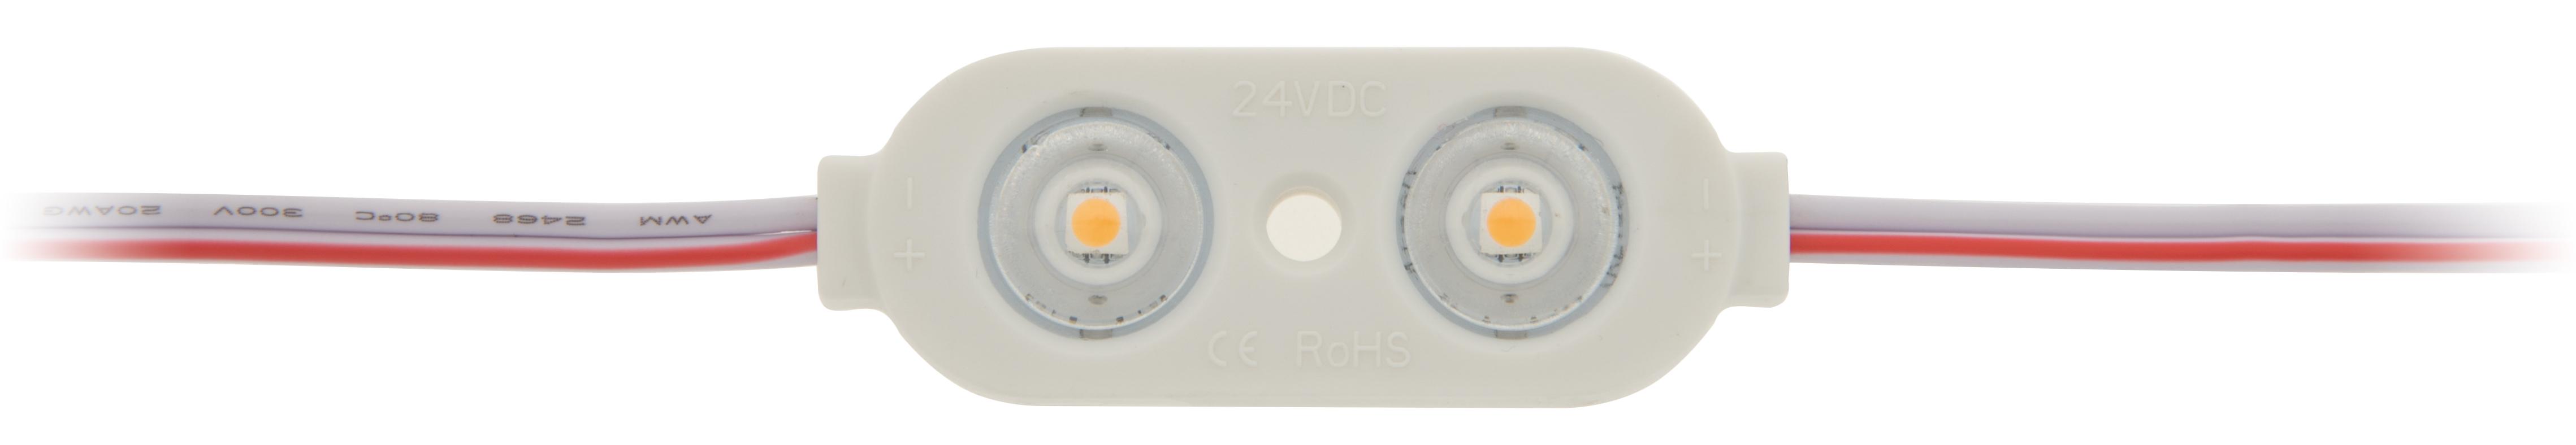 1 Stk LED Modulkette Twin 12 CW (Kalt Weiss)  IP65  CRI/RA 90+ LIMK002004